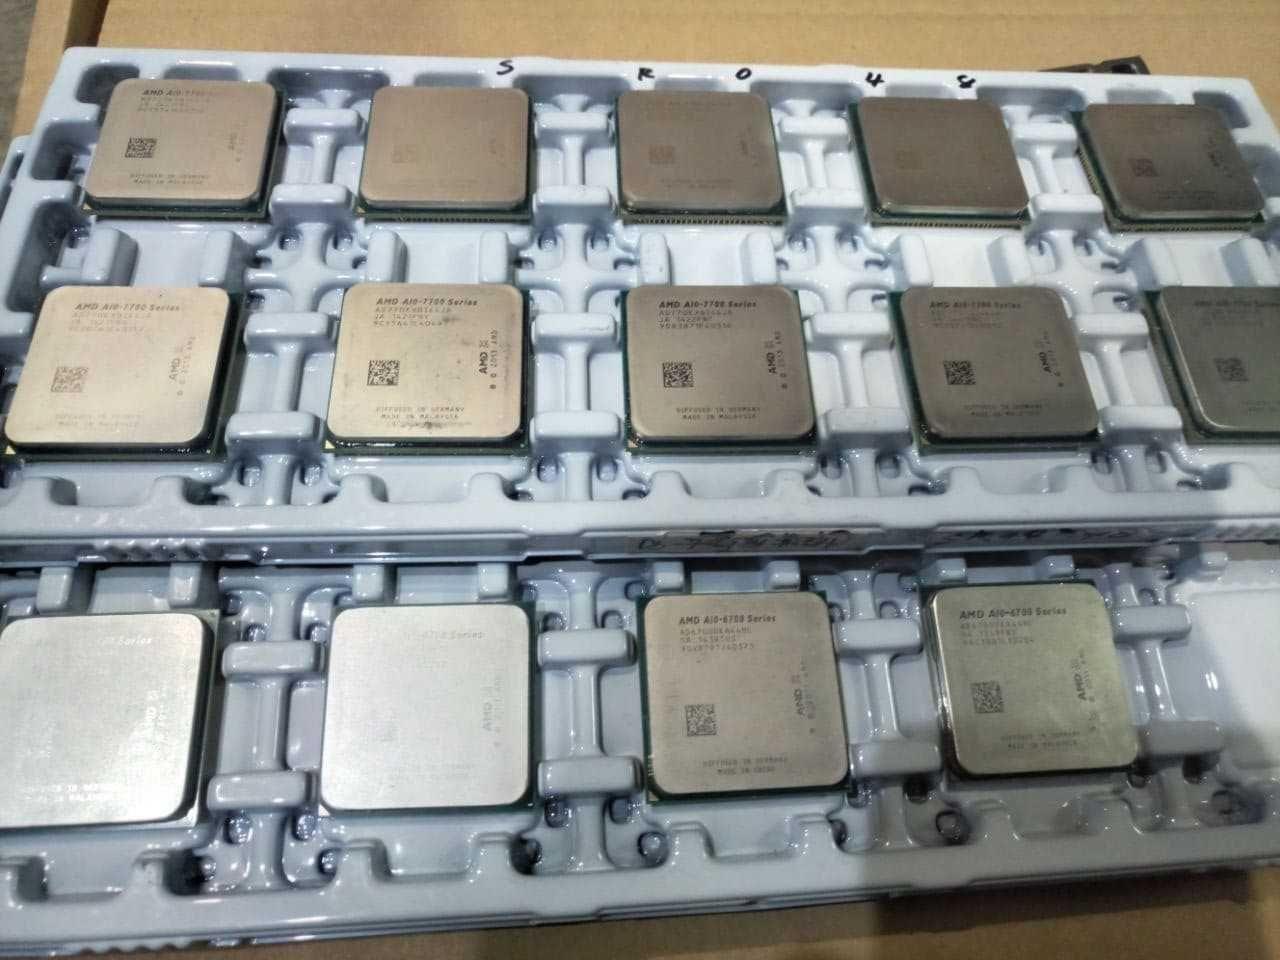 AMD A10 5800K 6700 7700K 7800 7860k 8750 FM2+ FM2 АМД A6 A8 A4 Trinity